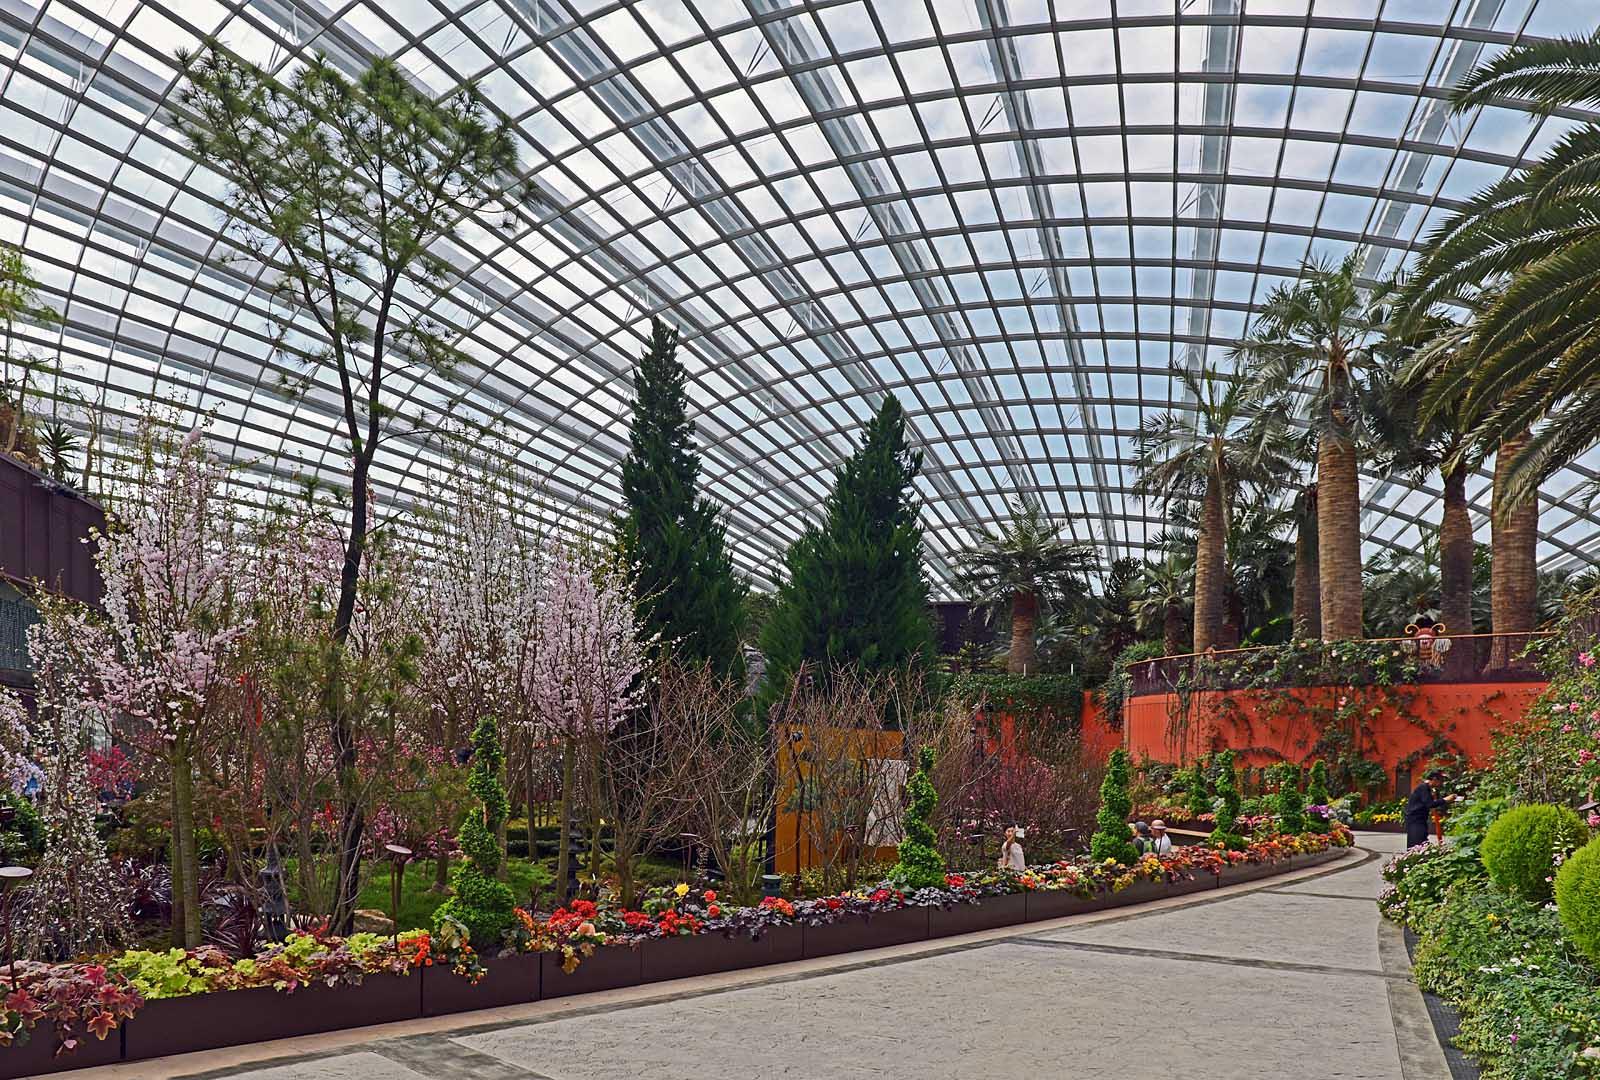 Singapore Flower Dome...